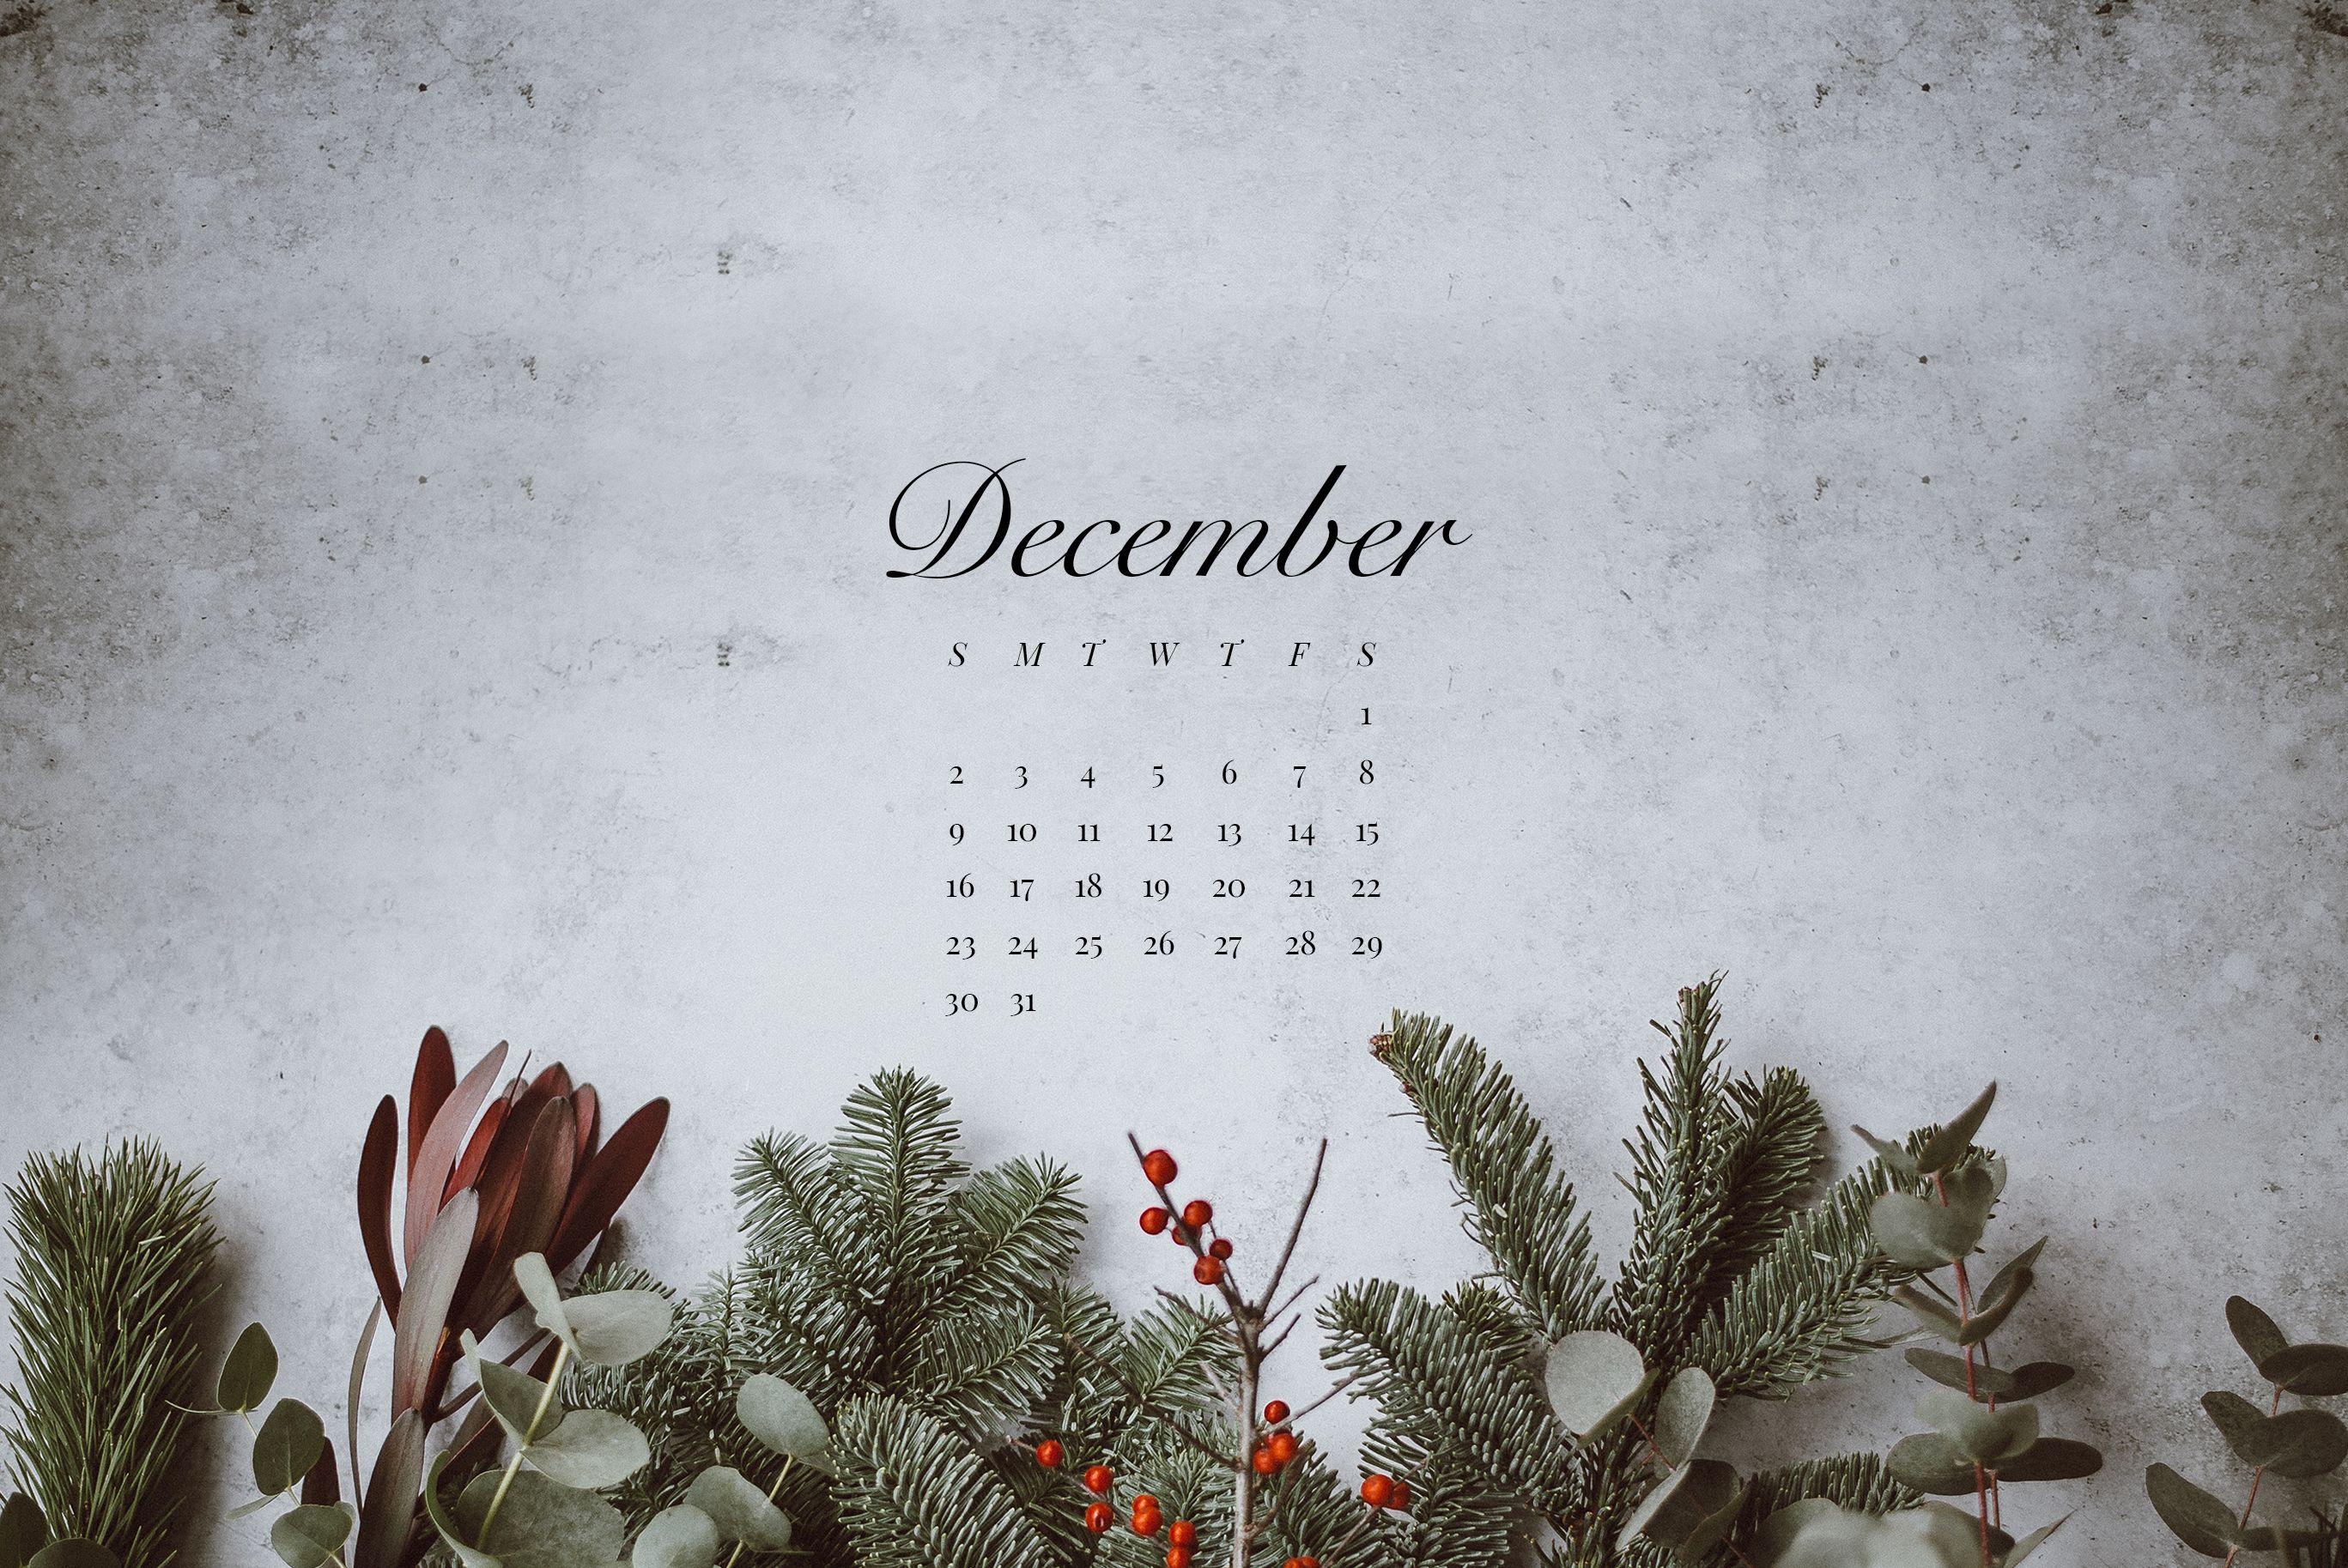 December Desktop And Mobile Wallpaper Christmas Desktop Wallpaper Christmas Desktop Wallpaper